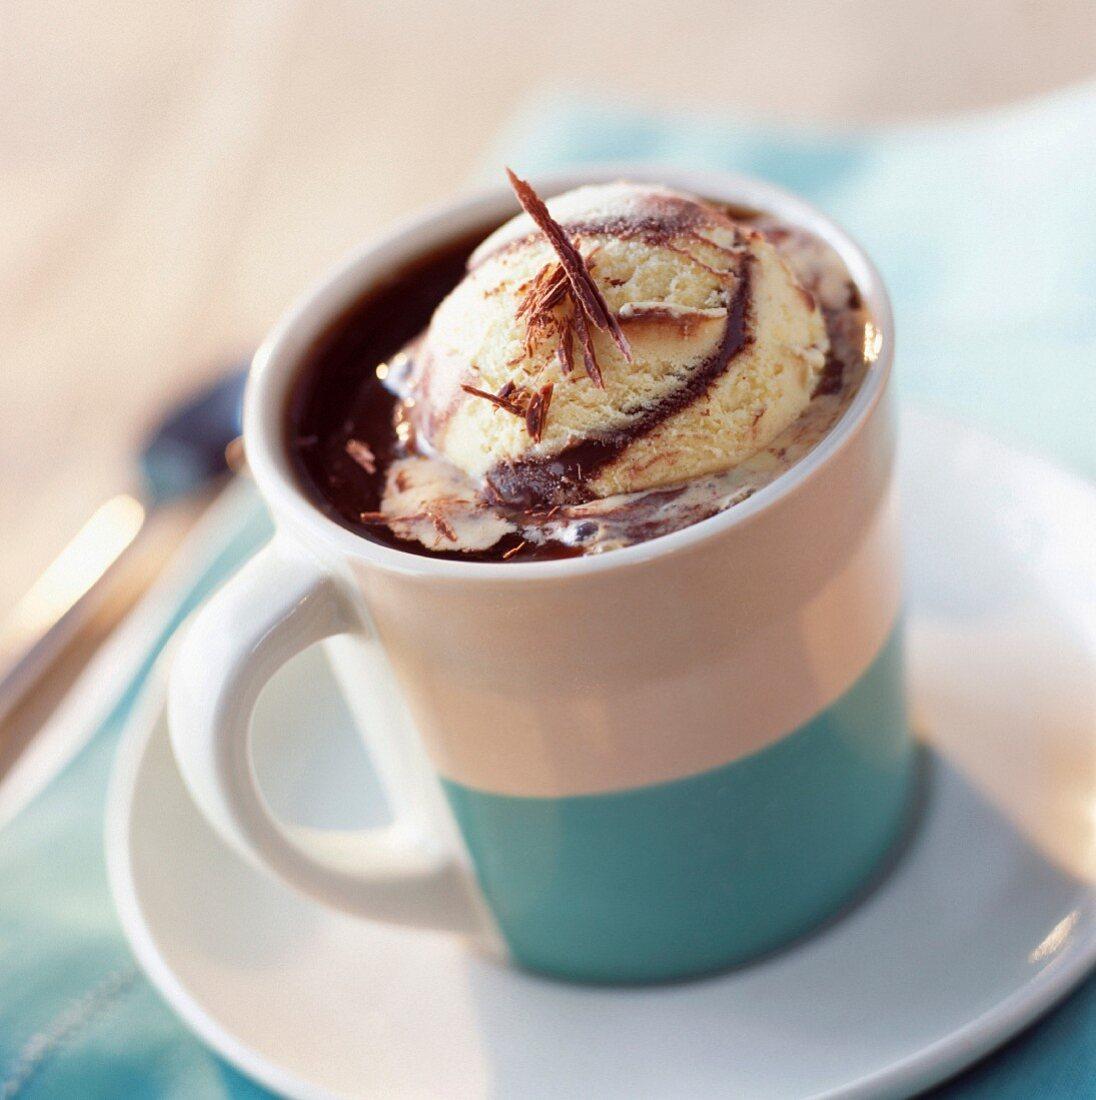 Mug of hot chocolate with scoop of ice cream